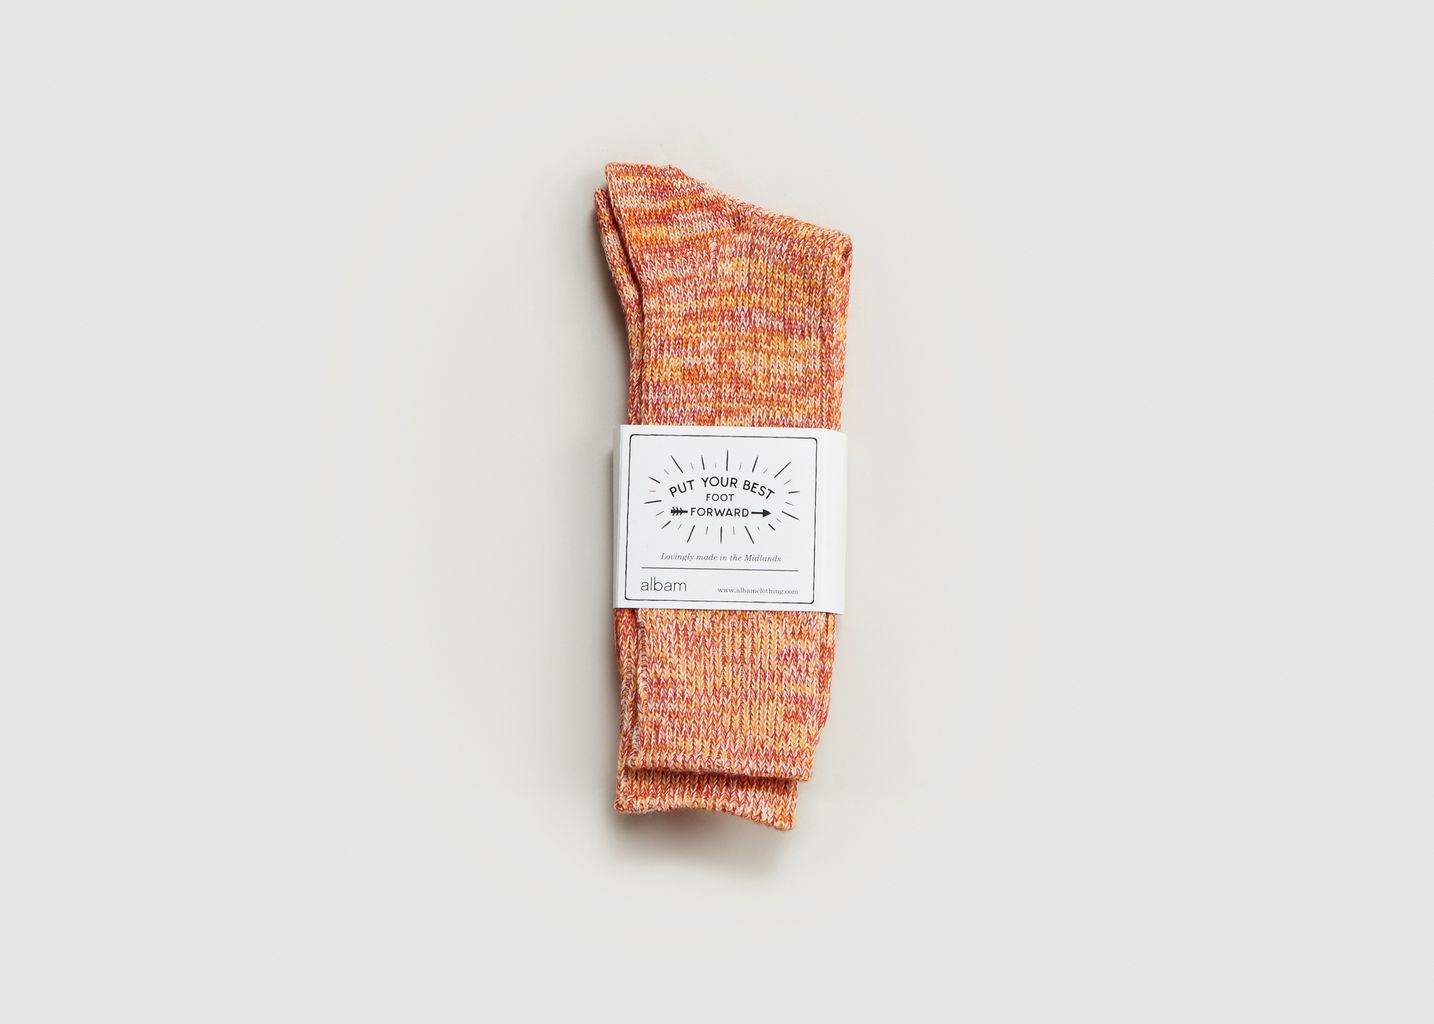 Chaussettes Marl - Albam